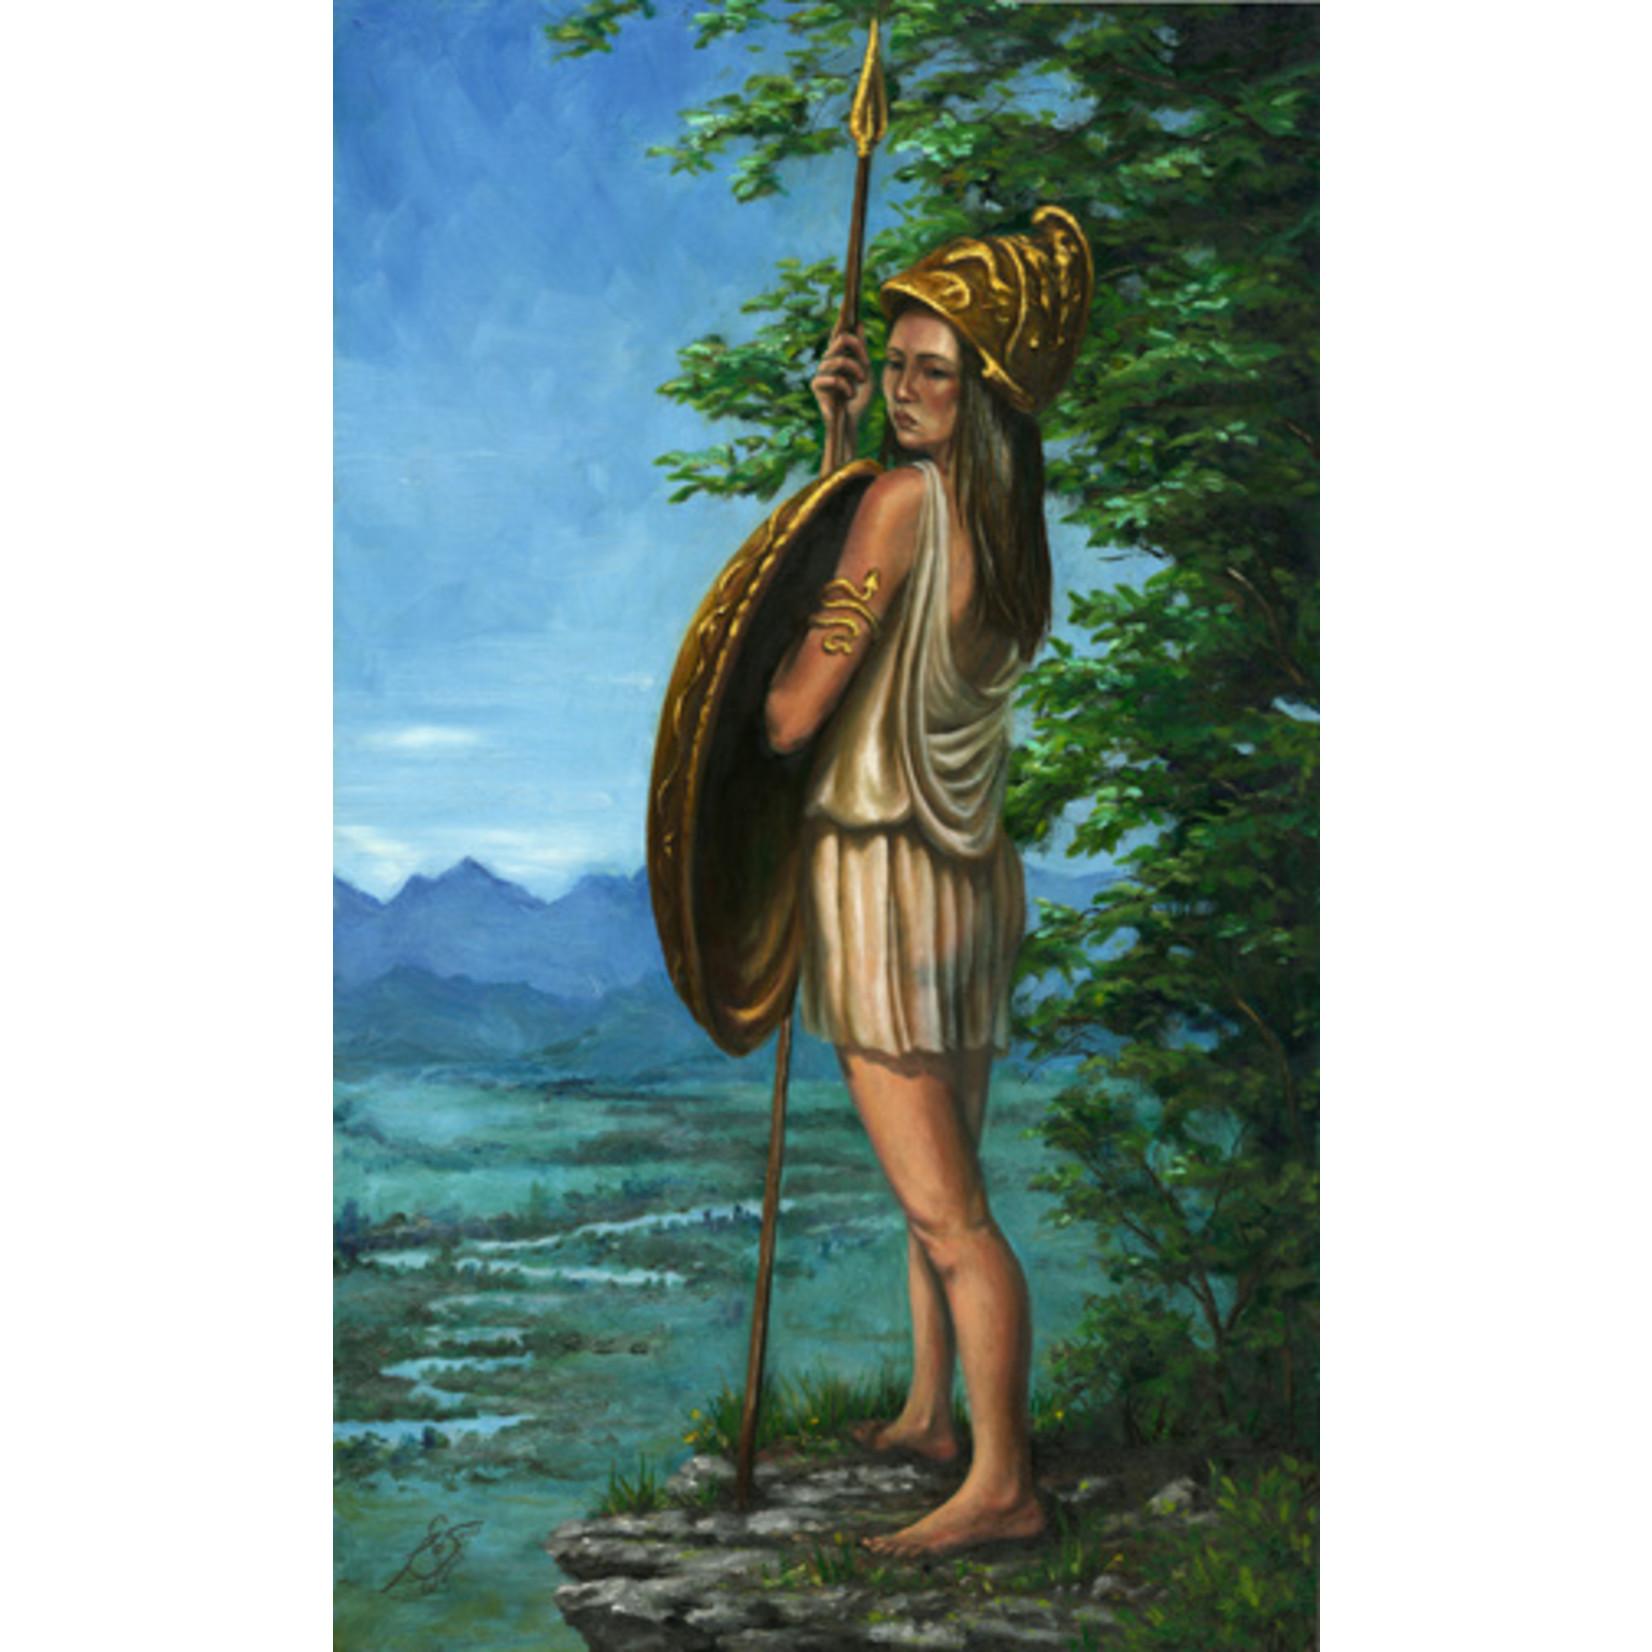 """Penthesilia, Queen of the Amazons"" by Roxana Sinex 17"" x 10"" Warrior Women Series"